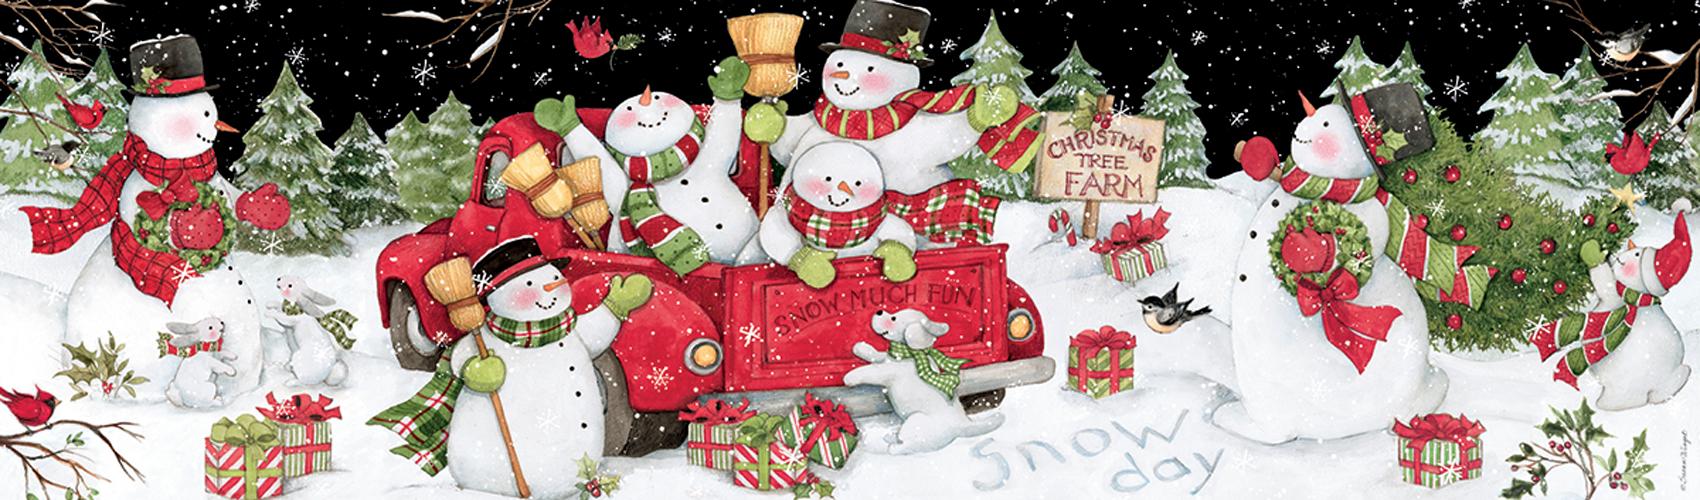 Snow Day Snowman Jigsaw Puzzle